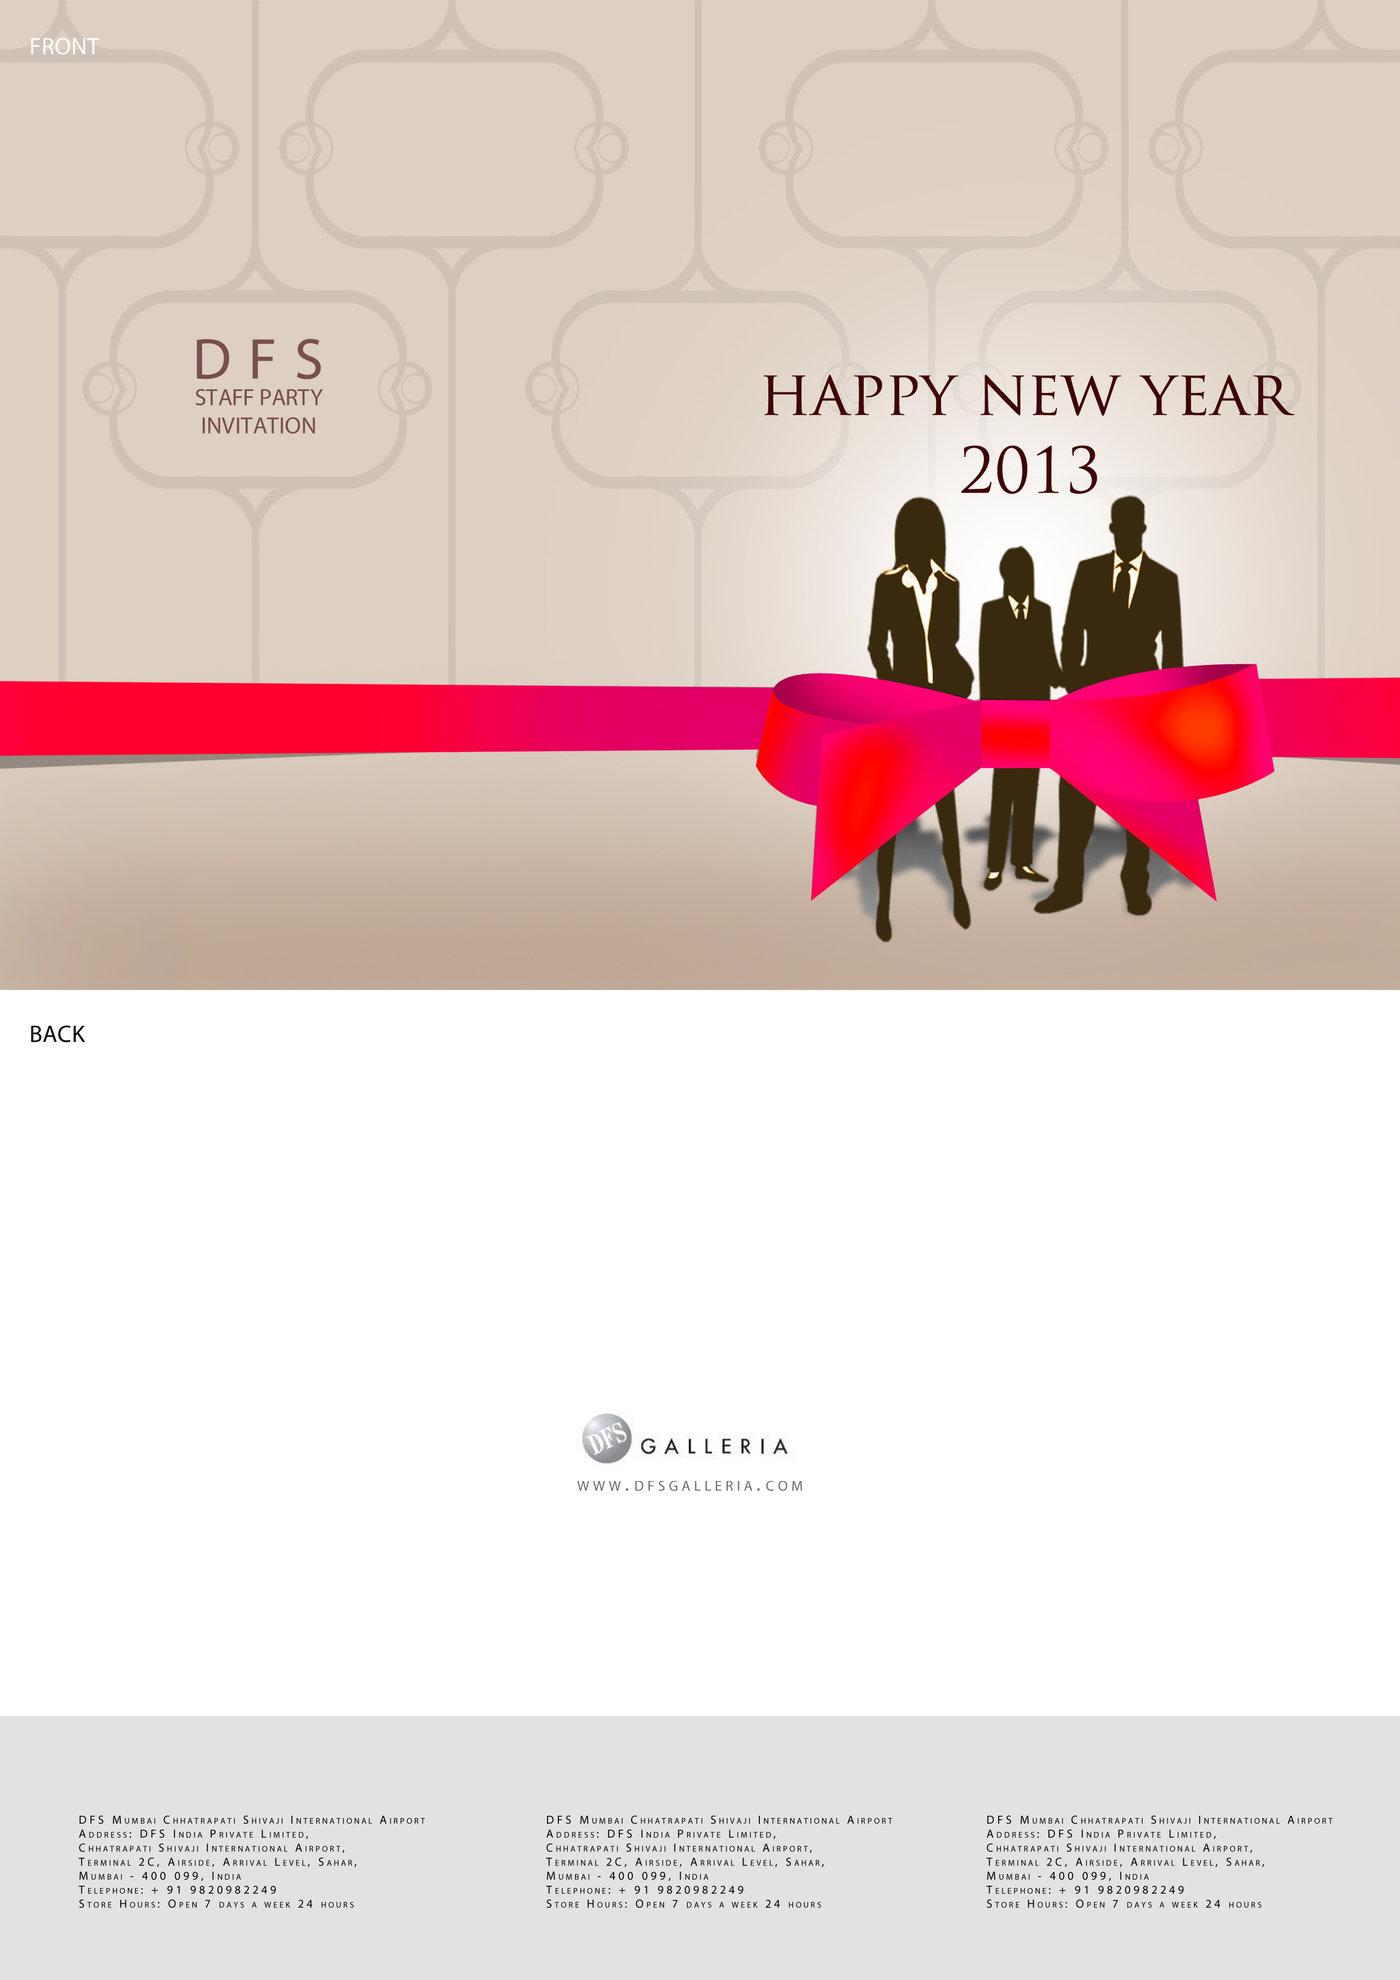 DFS Staff Party Invitation Sample Layout by shaikh sarfaraz at ...